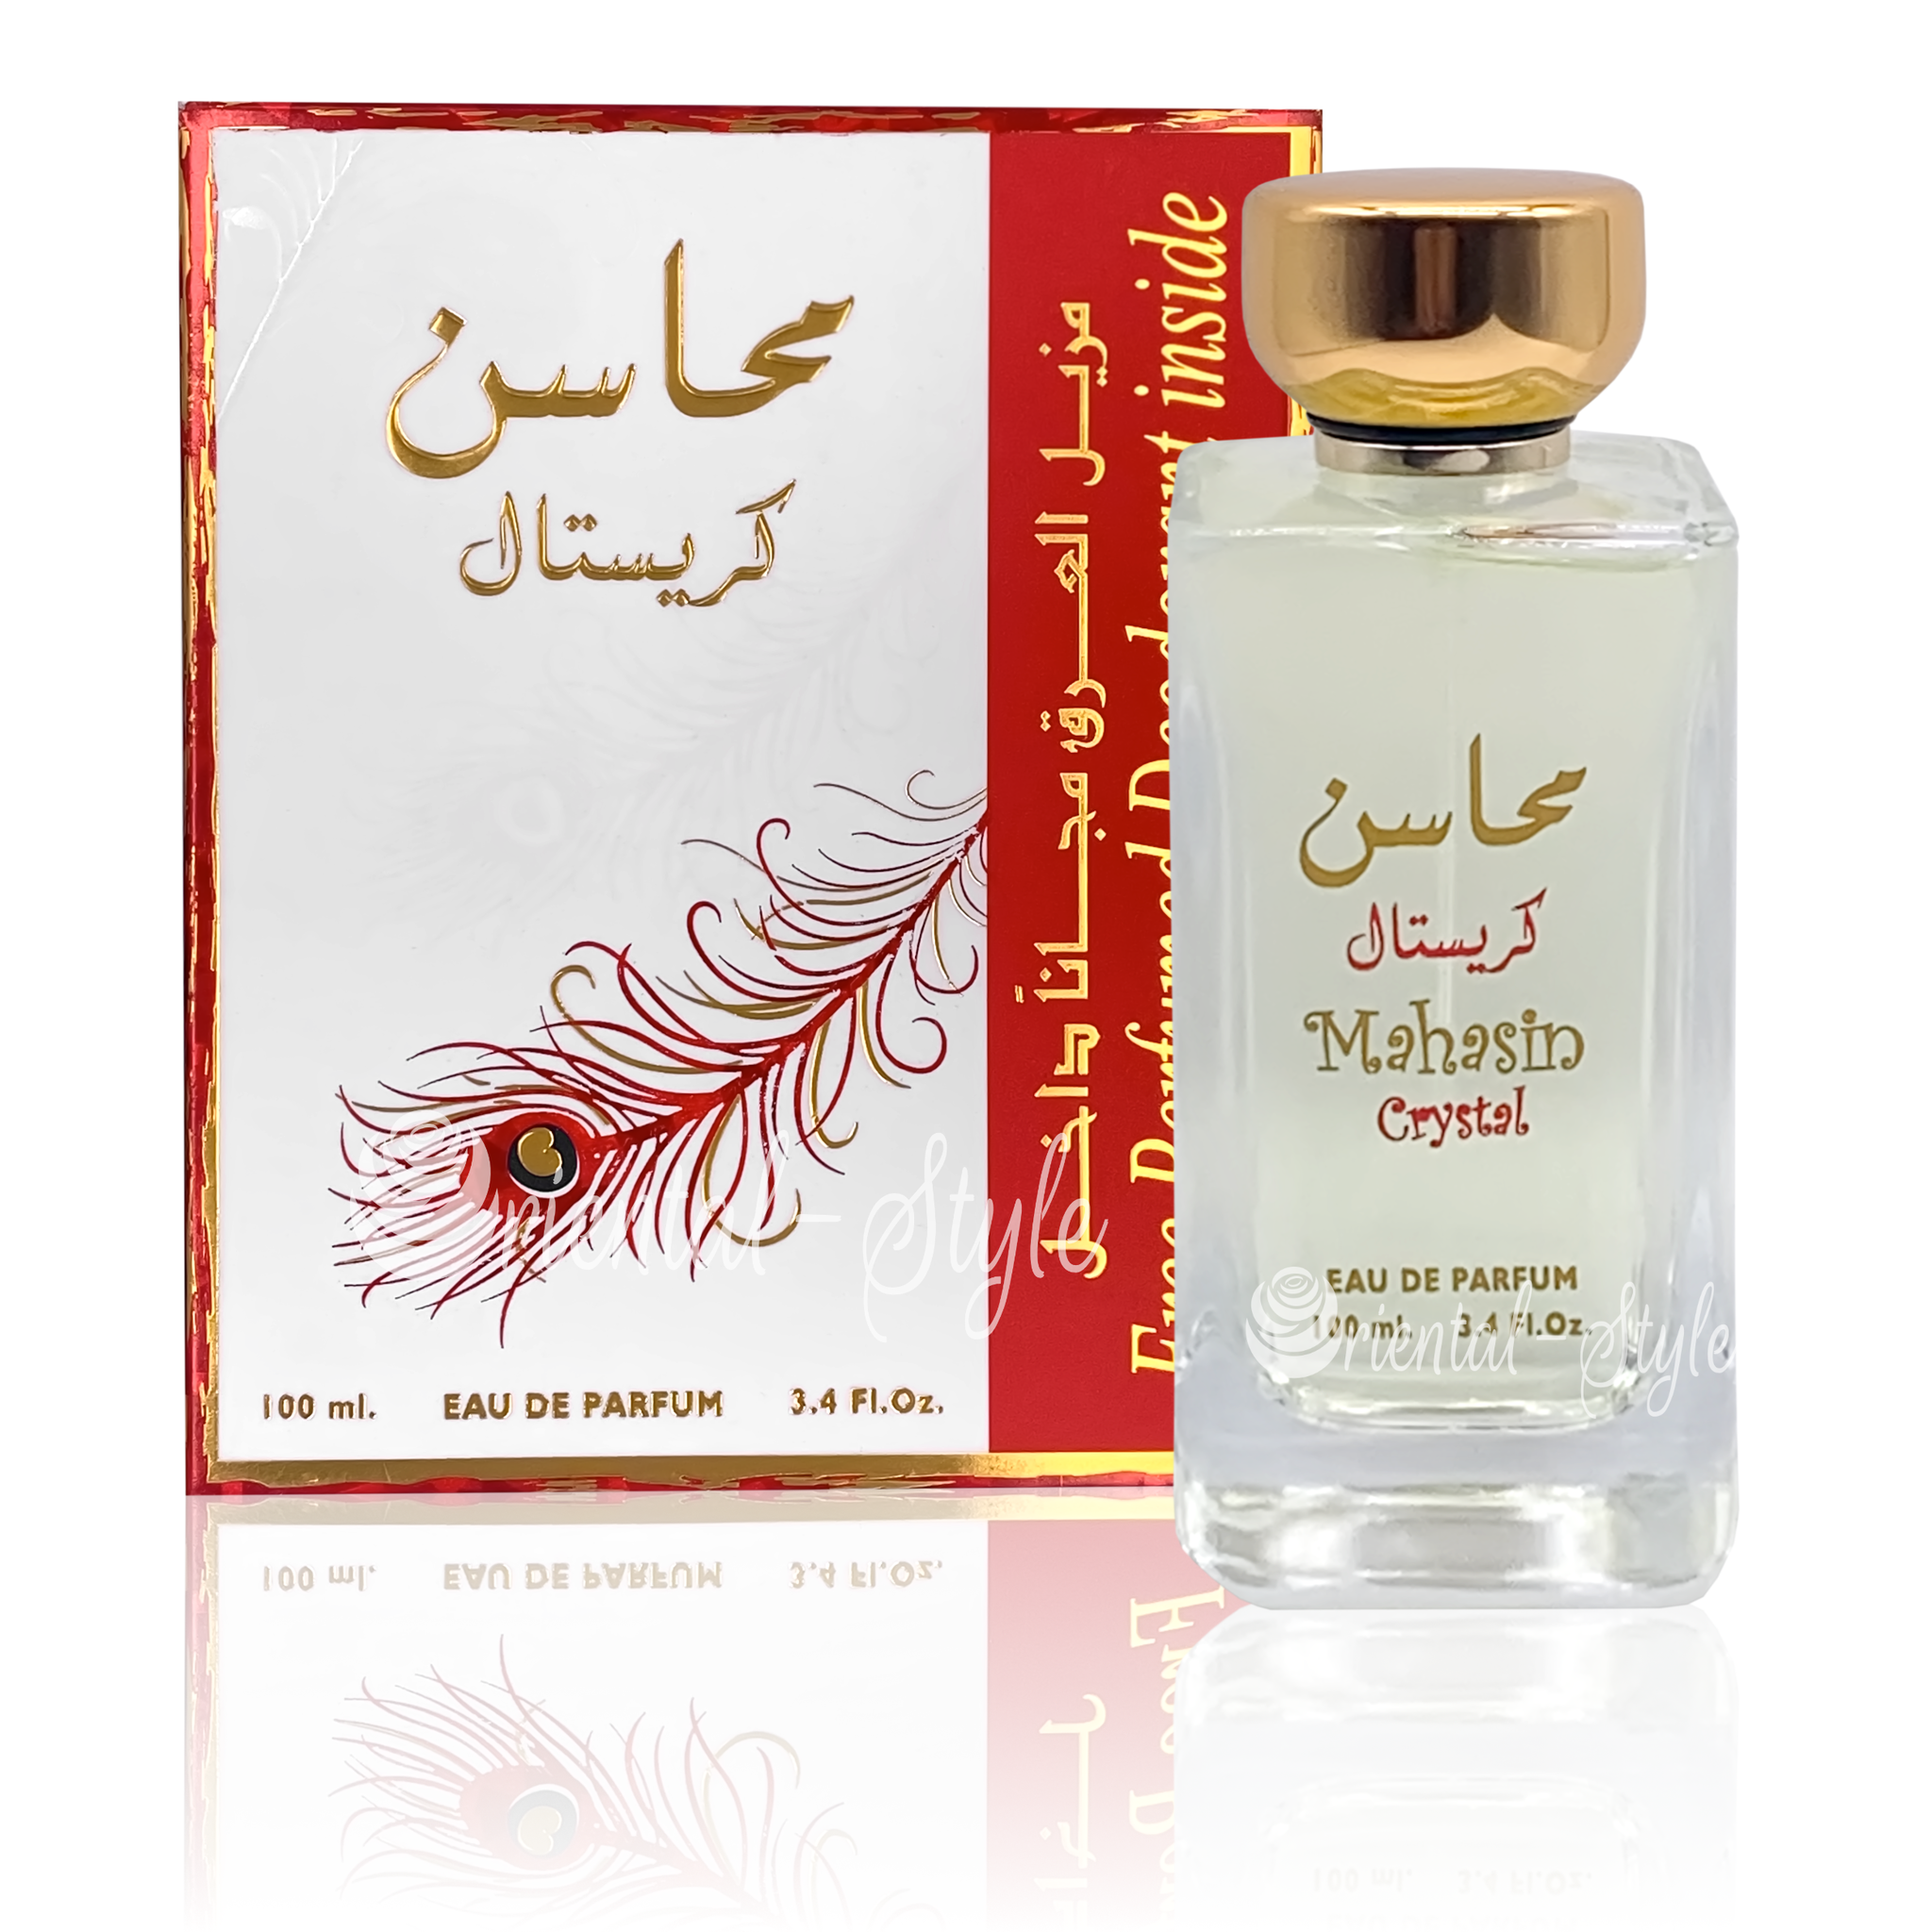 Parfüm Mahasin Crystal 100ml von Ard Al Zaafaran